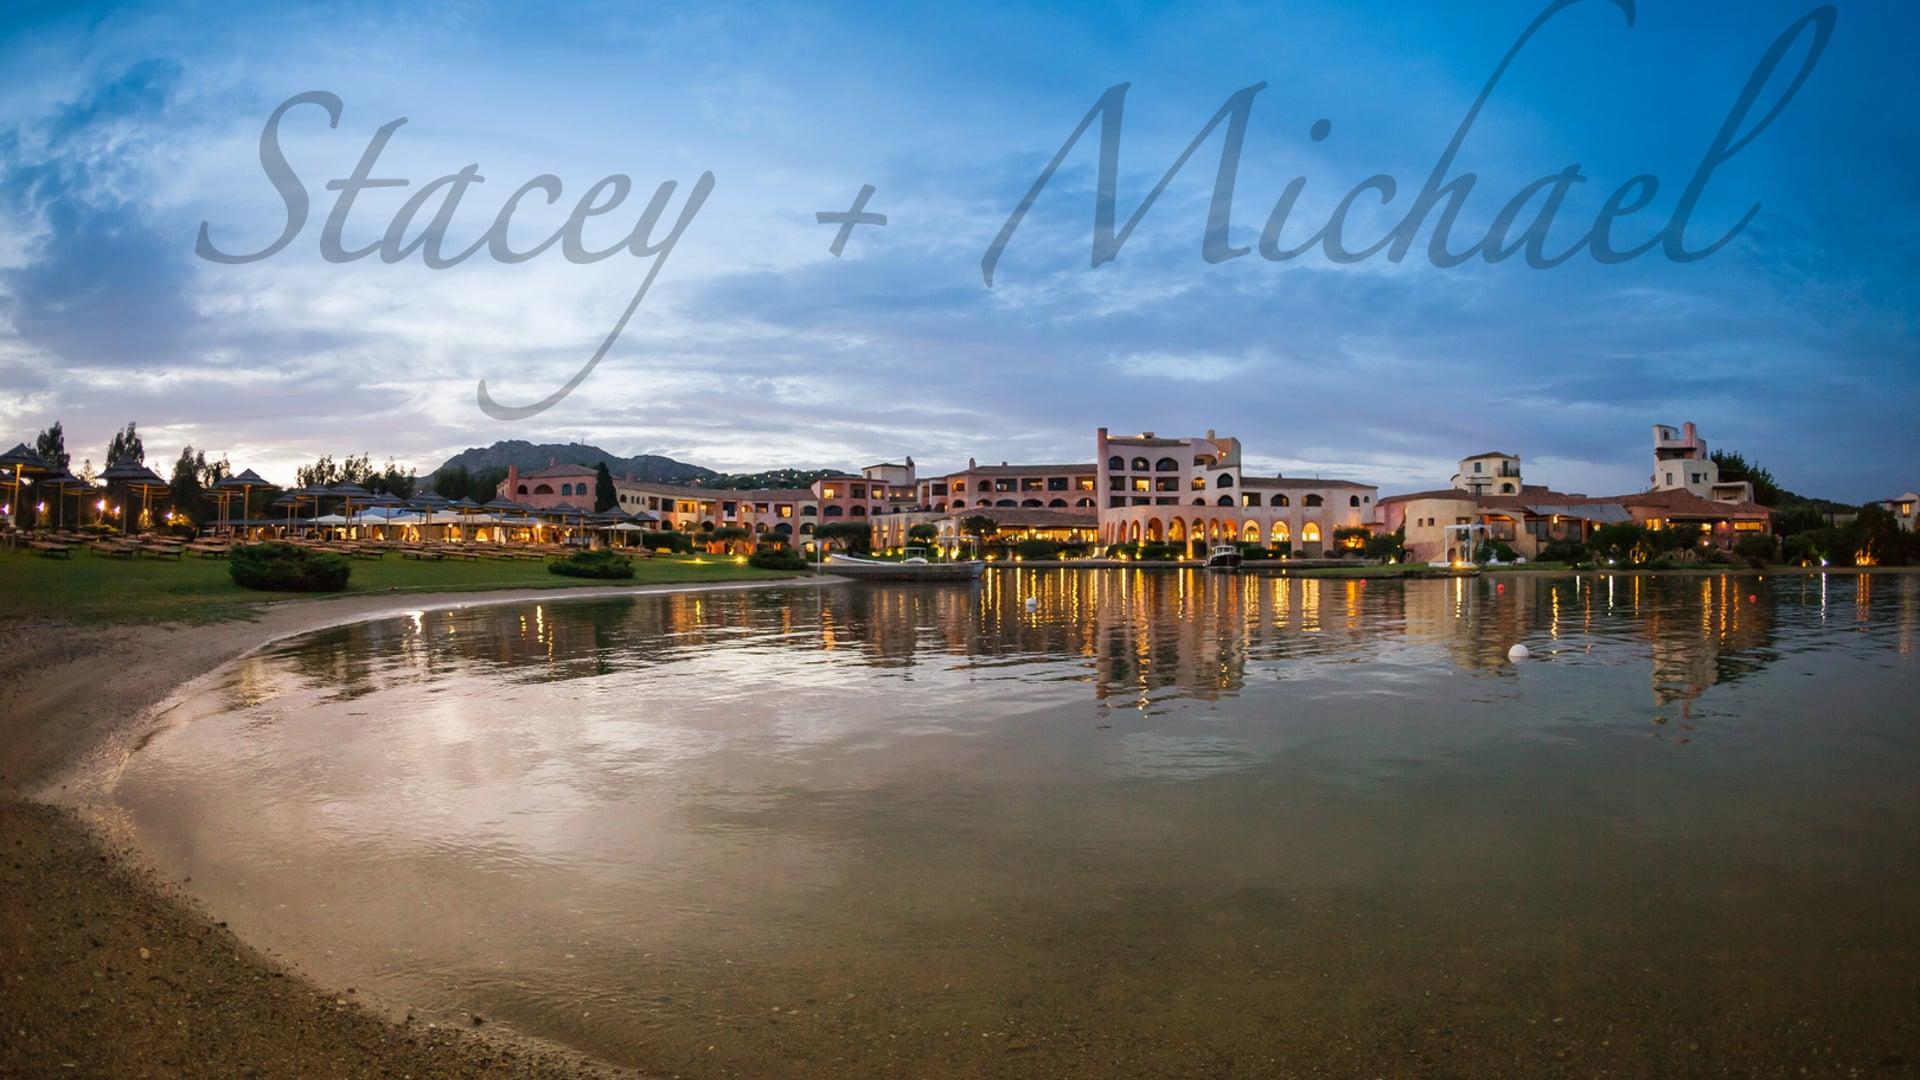 Stacey + Michael // wedding teaser